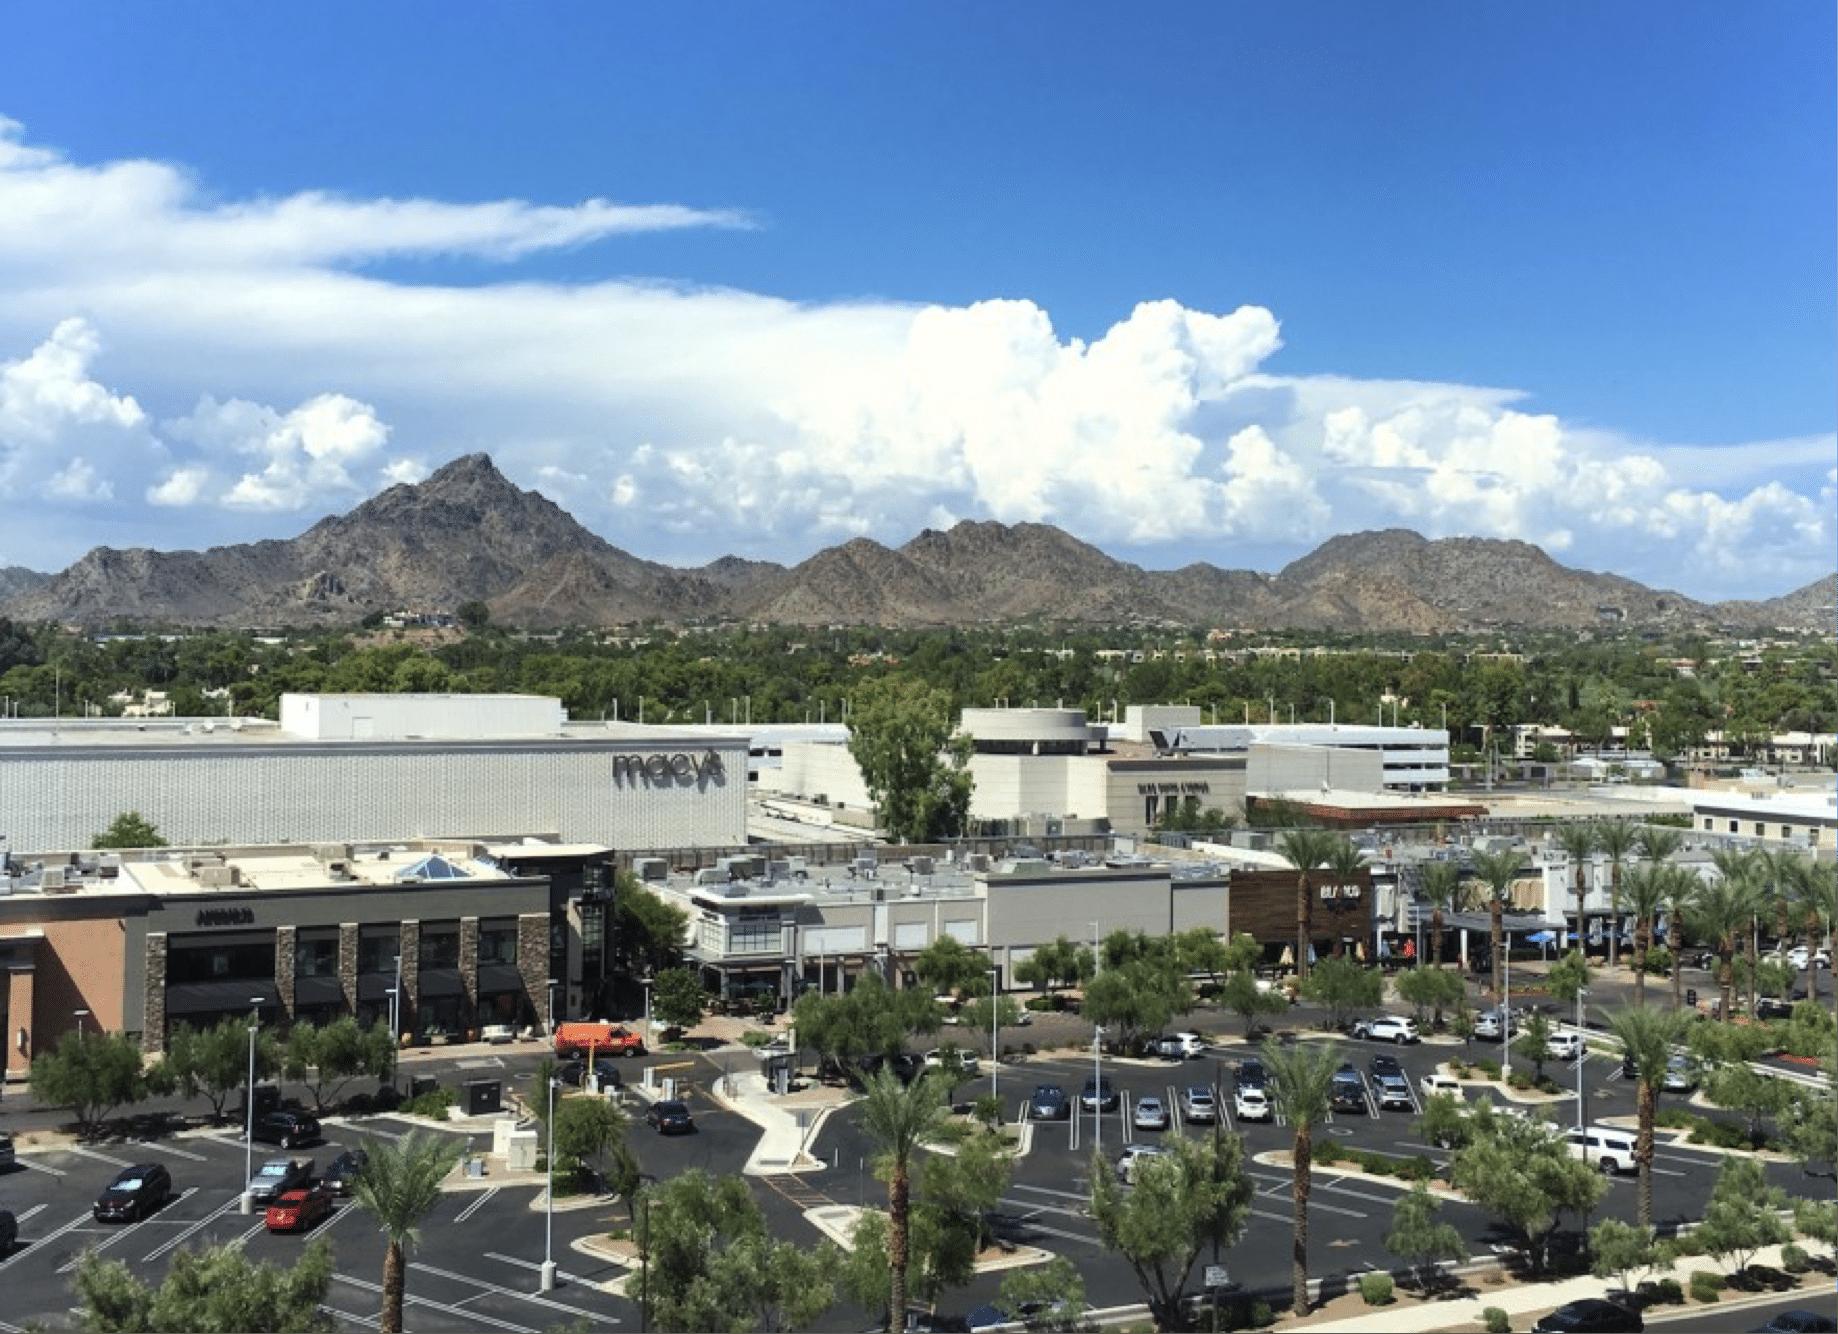 Biltmore Fashion Park for Best Girlfriend Getaway to Phoenix